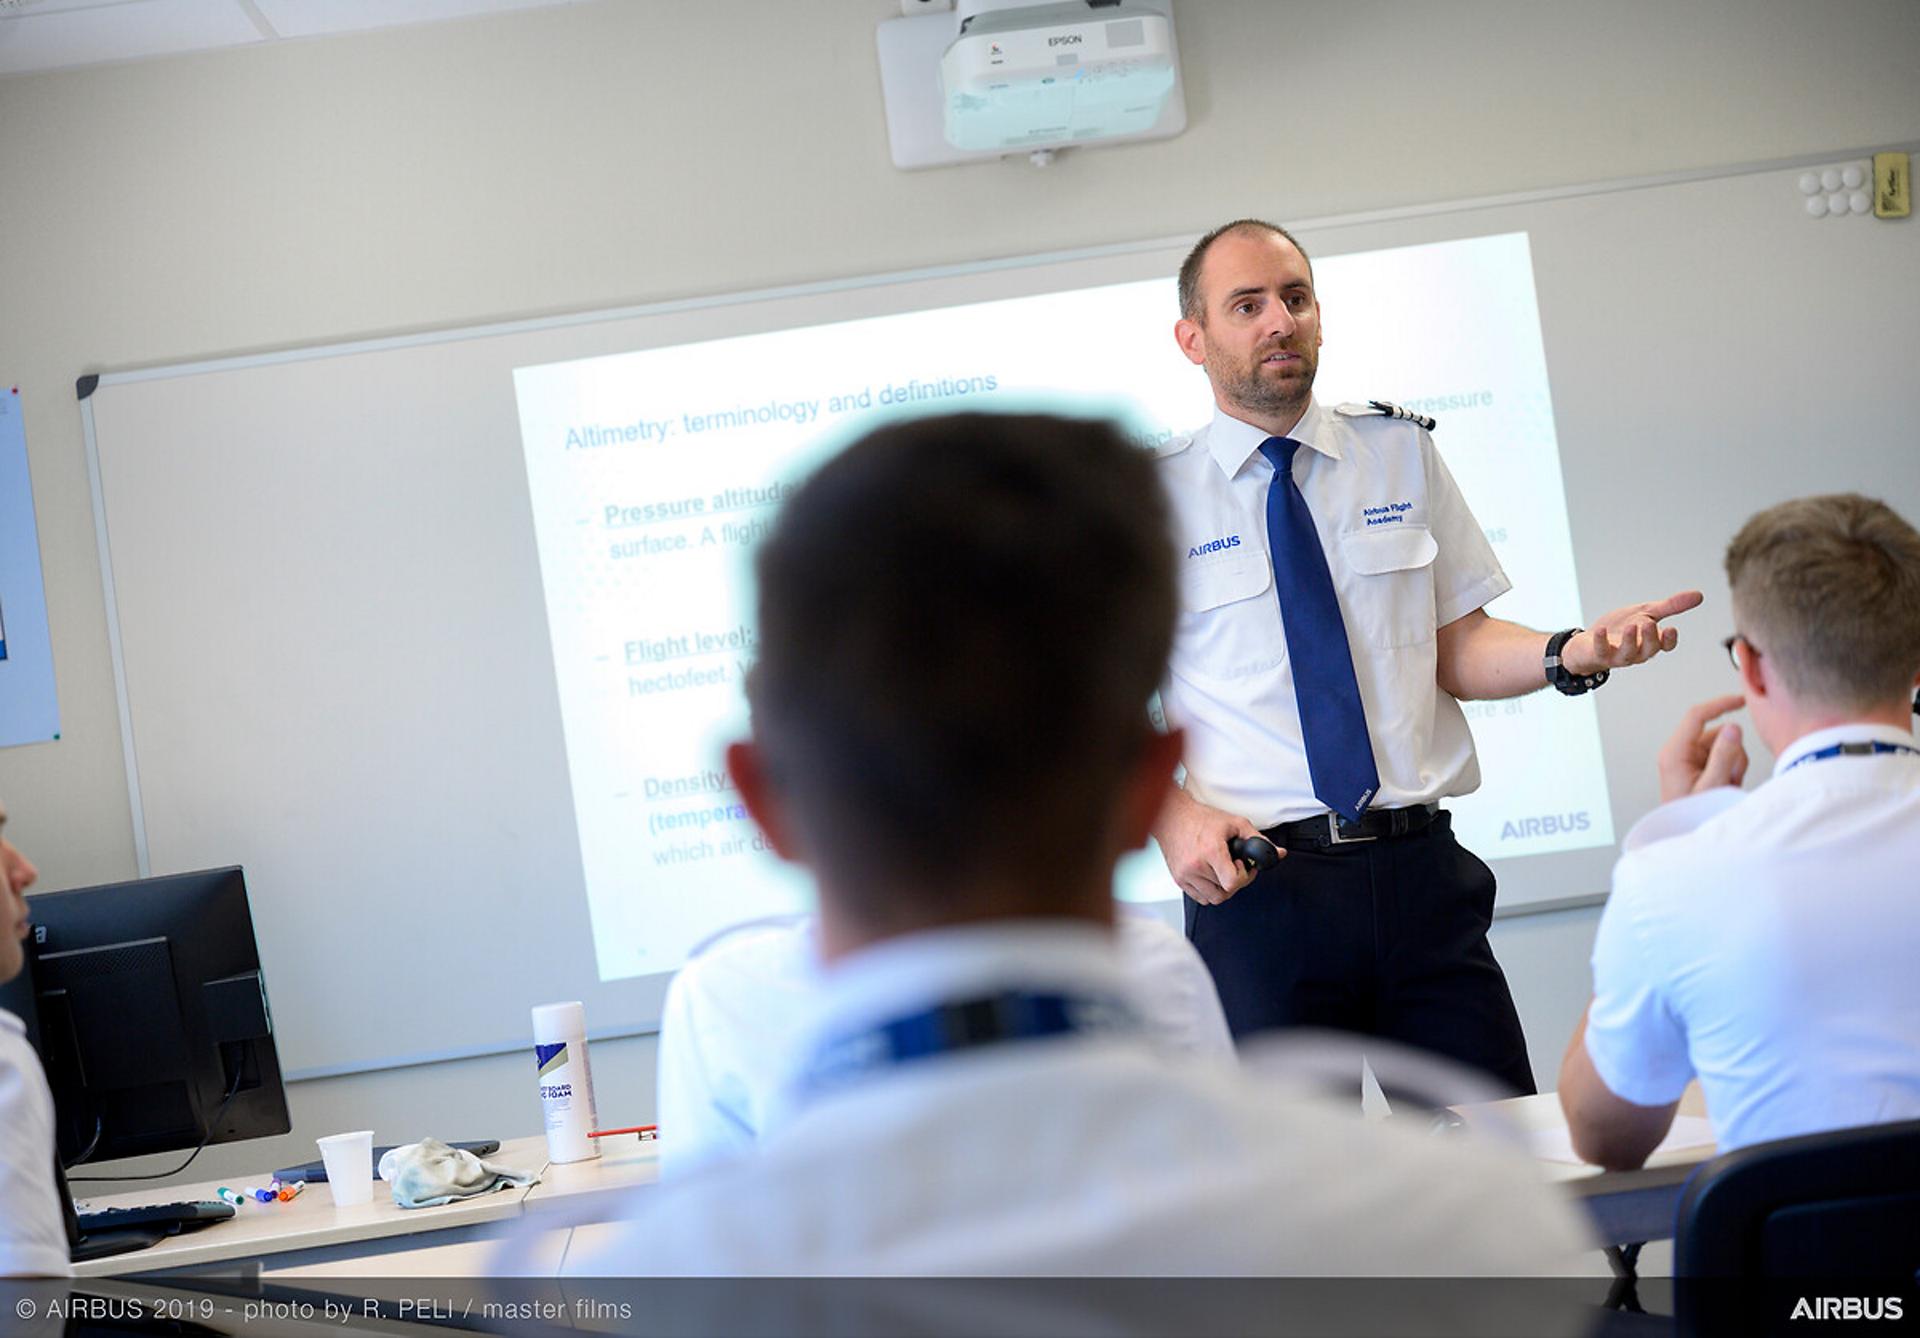 Airbus Flight Academy Instructor